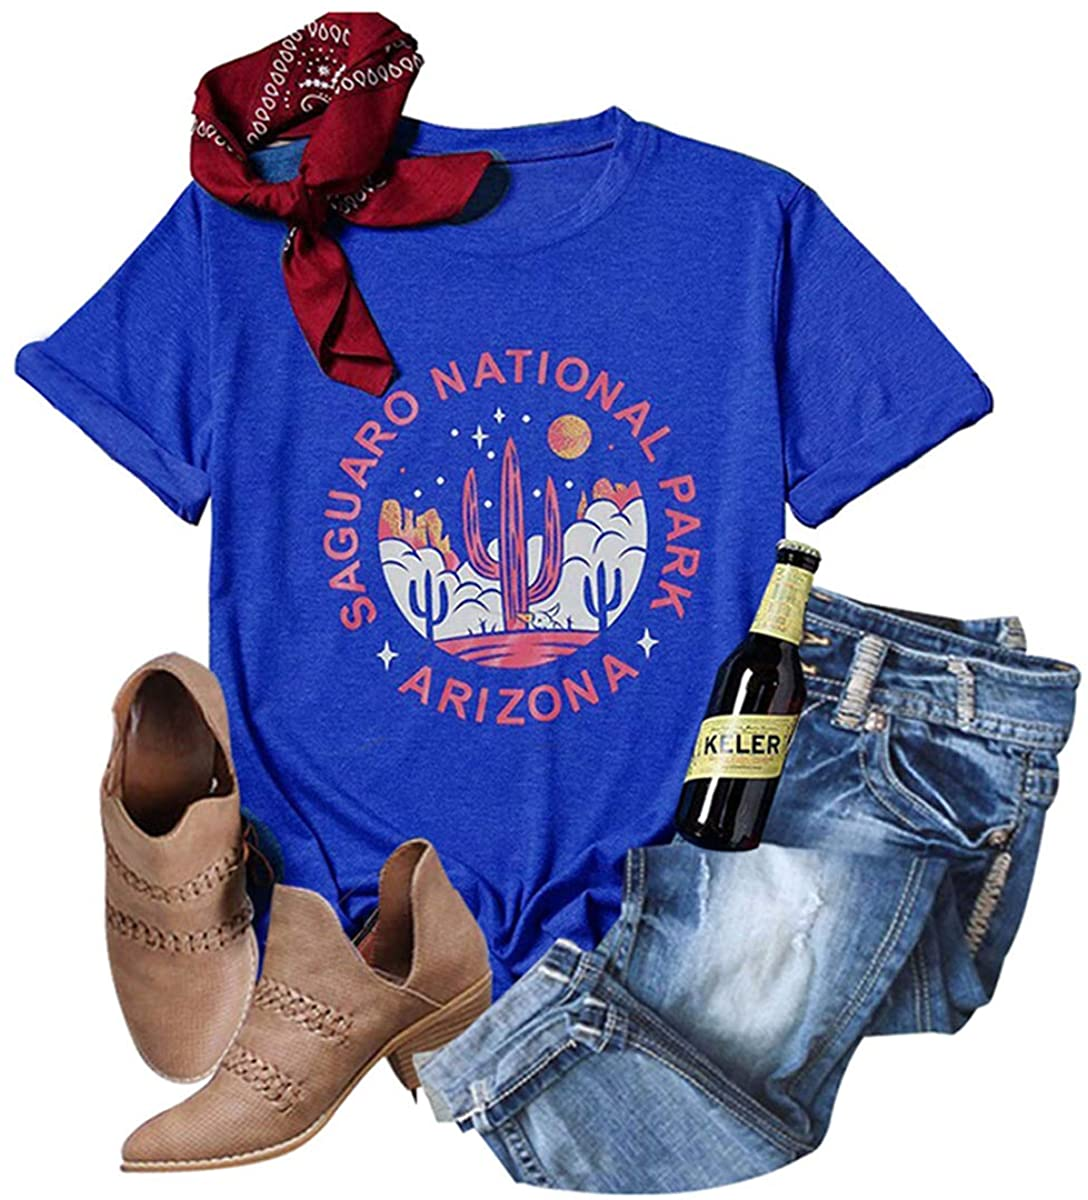 GEMLON Cactus T Shirt Women Travel Shirt Retro Western Graphic Tees Short Sleeve O Neck Casual Tops